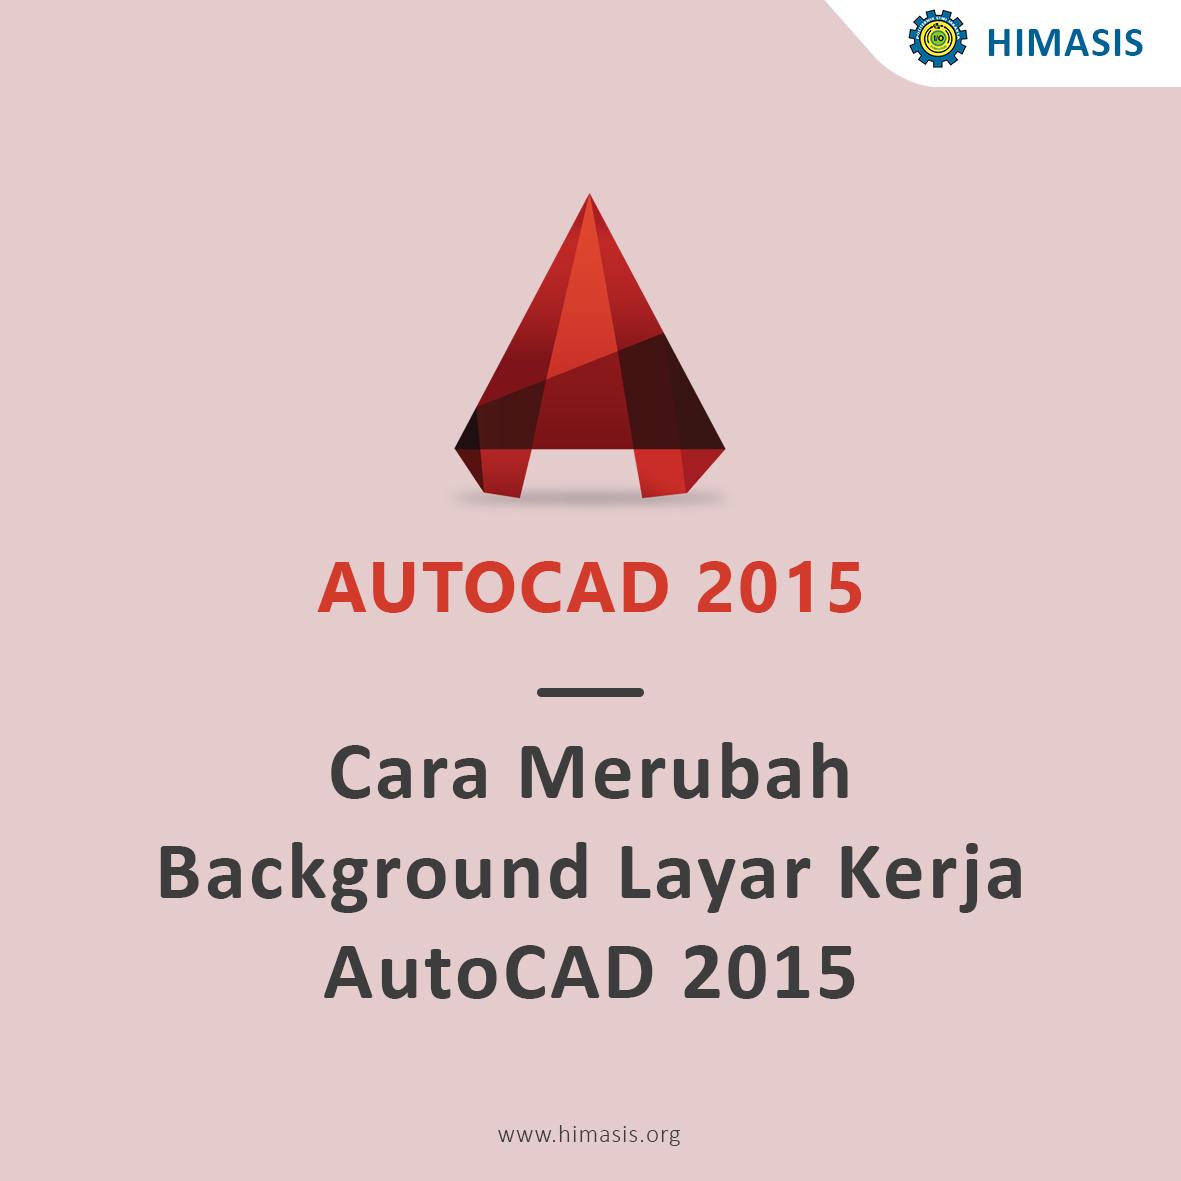 Cara Merubah Background Layar Kerja AutoCAD2015